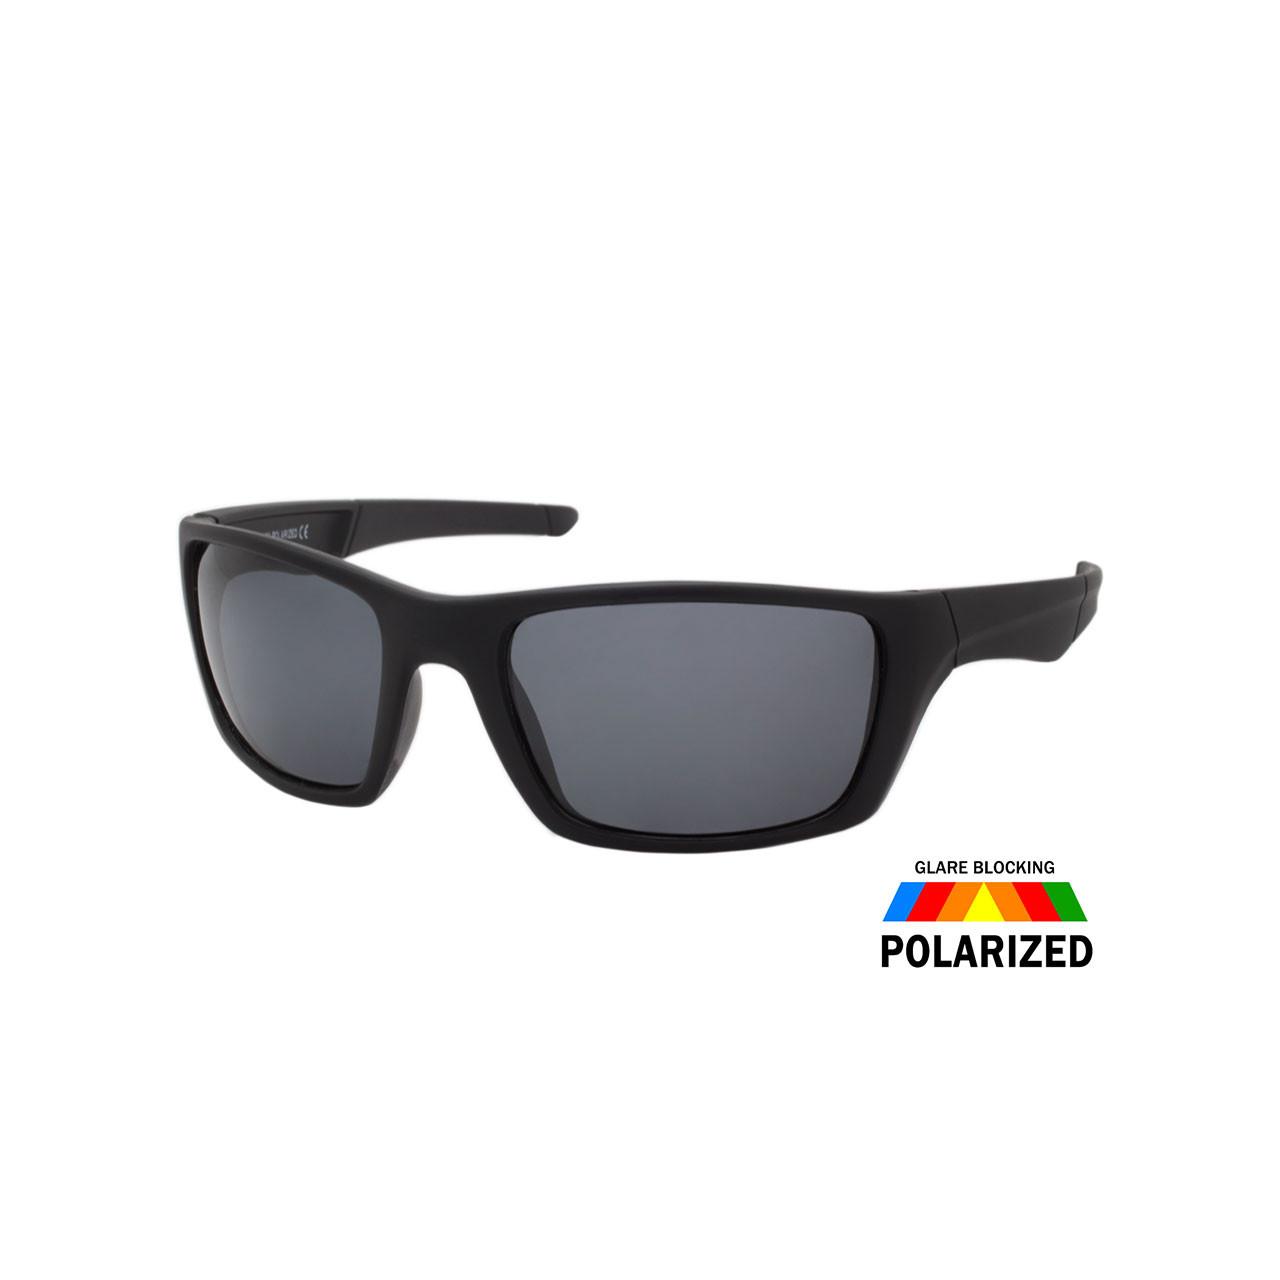 ef9b159270e Wholesale Assorted Colors Polycarbonate Polarized Sport Sunglasses ...